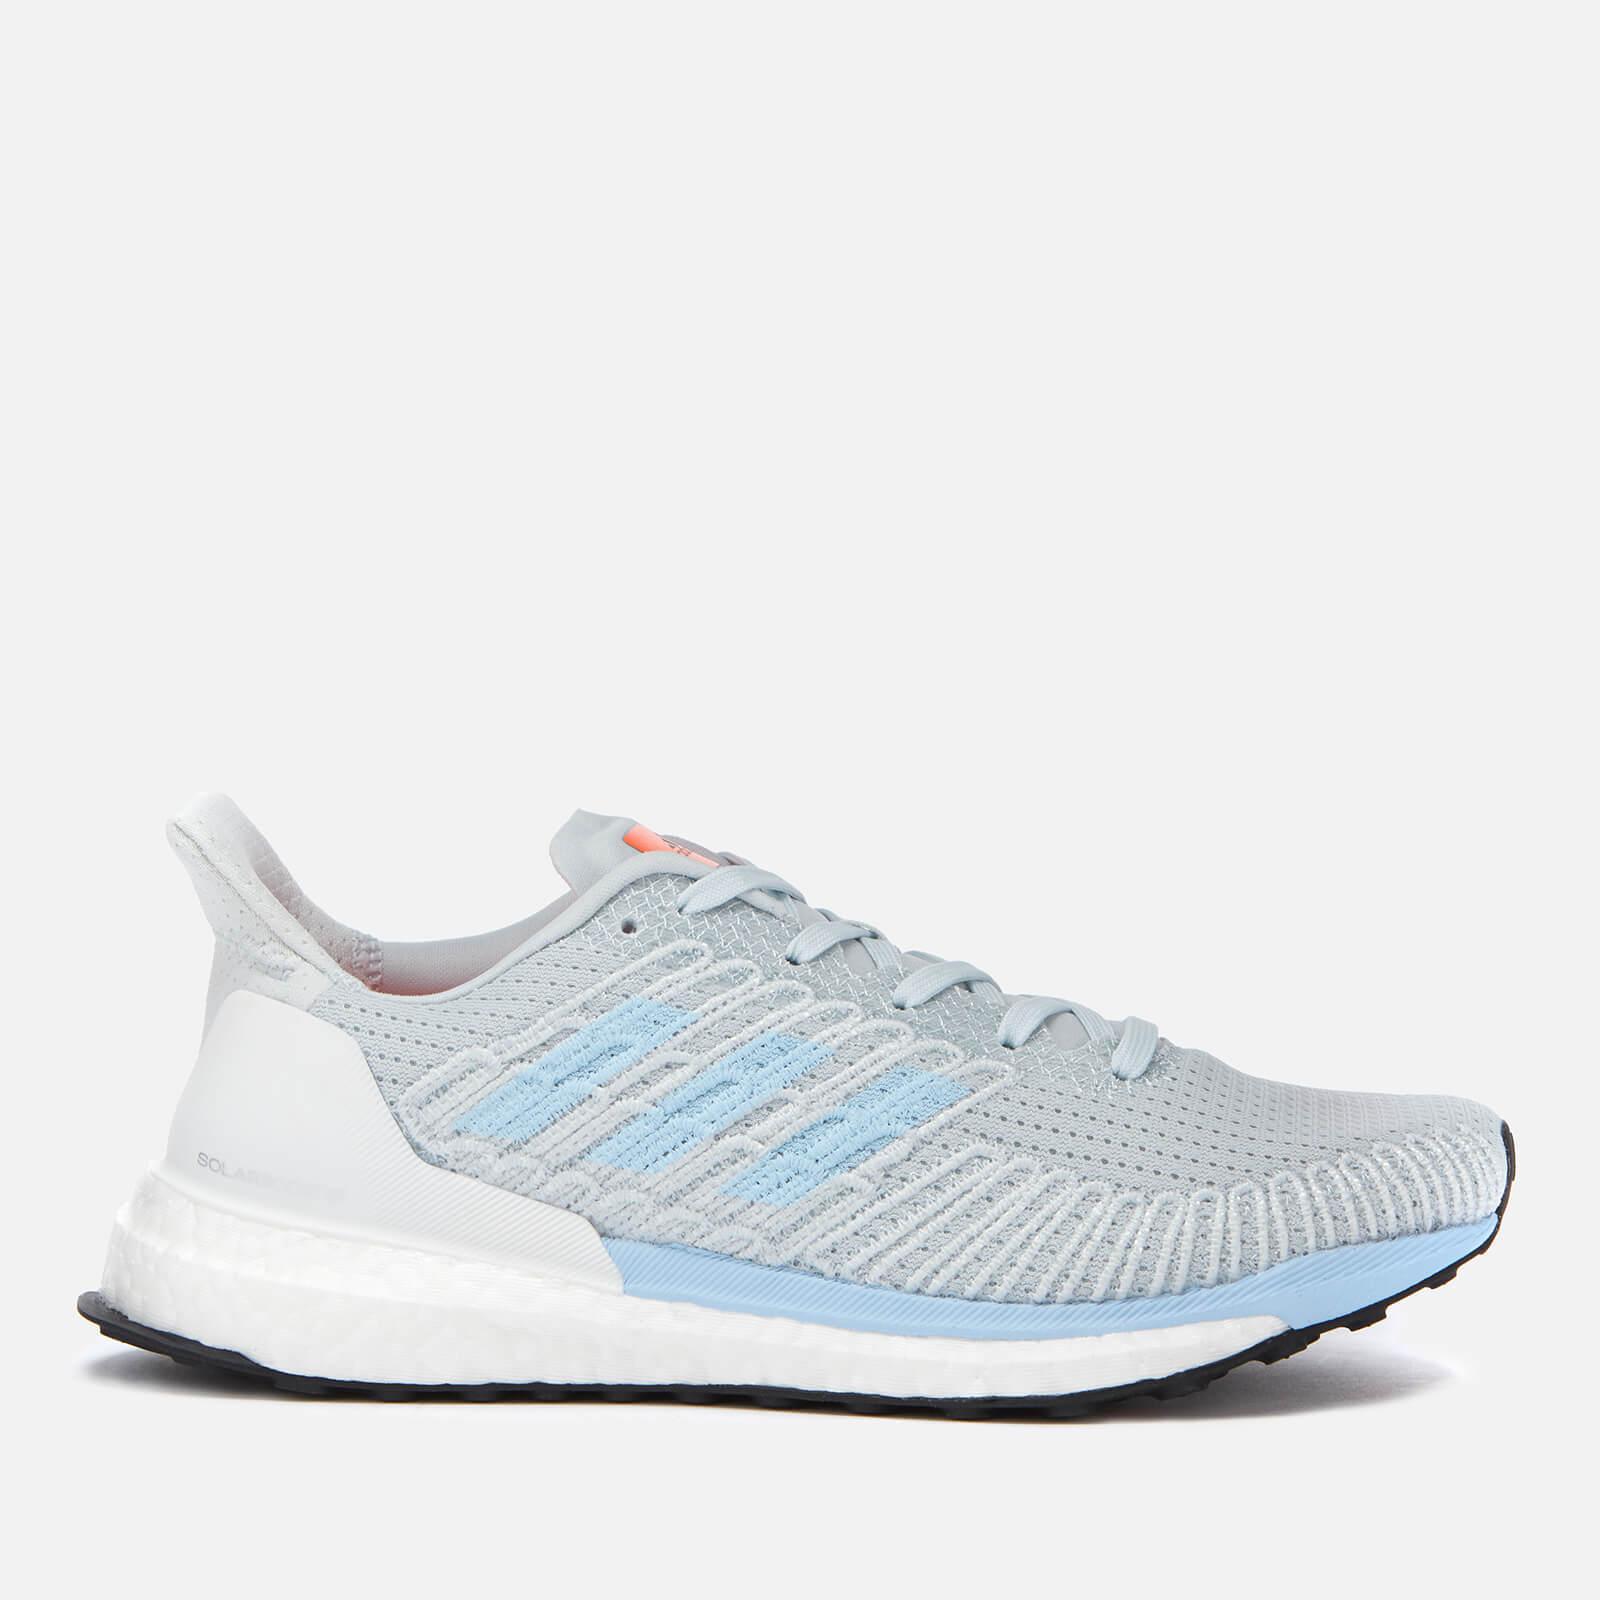 adidas Women's Solar Boost St Trainers - Blue - UK 8 - Blue